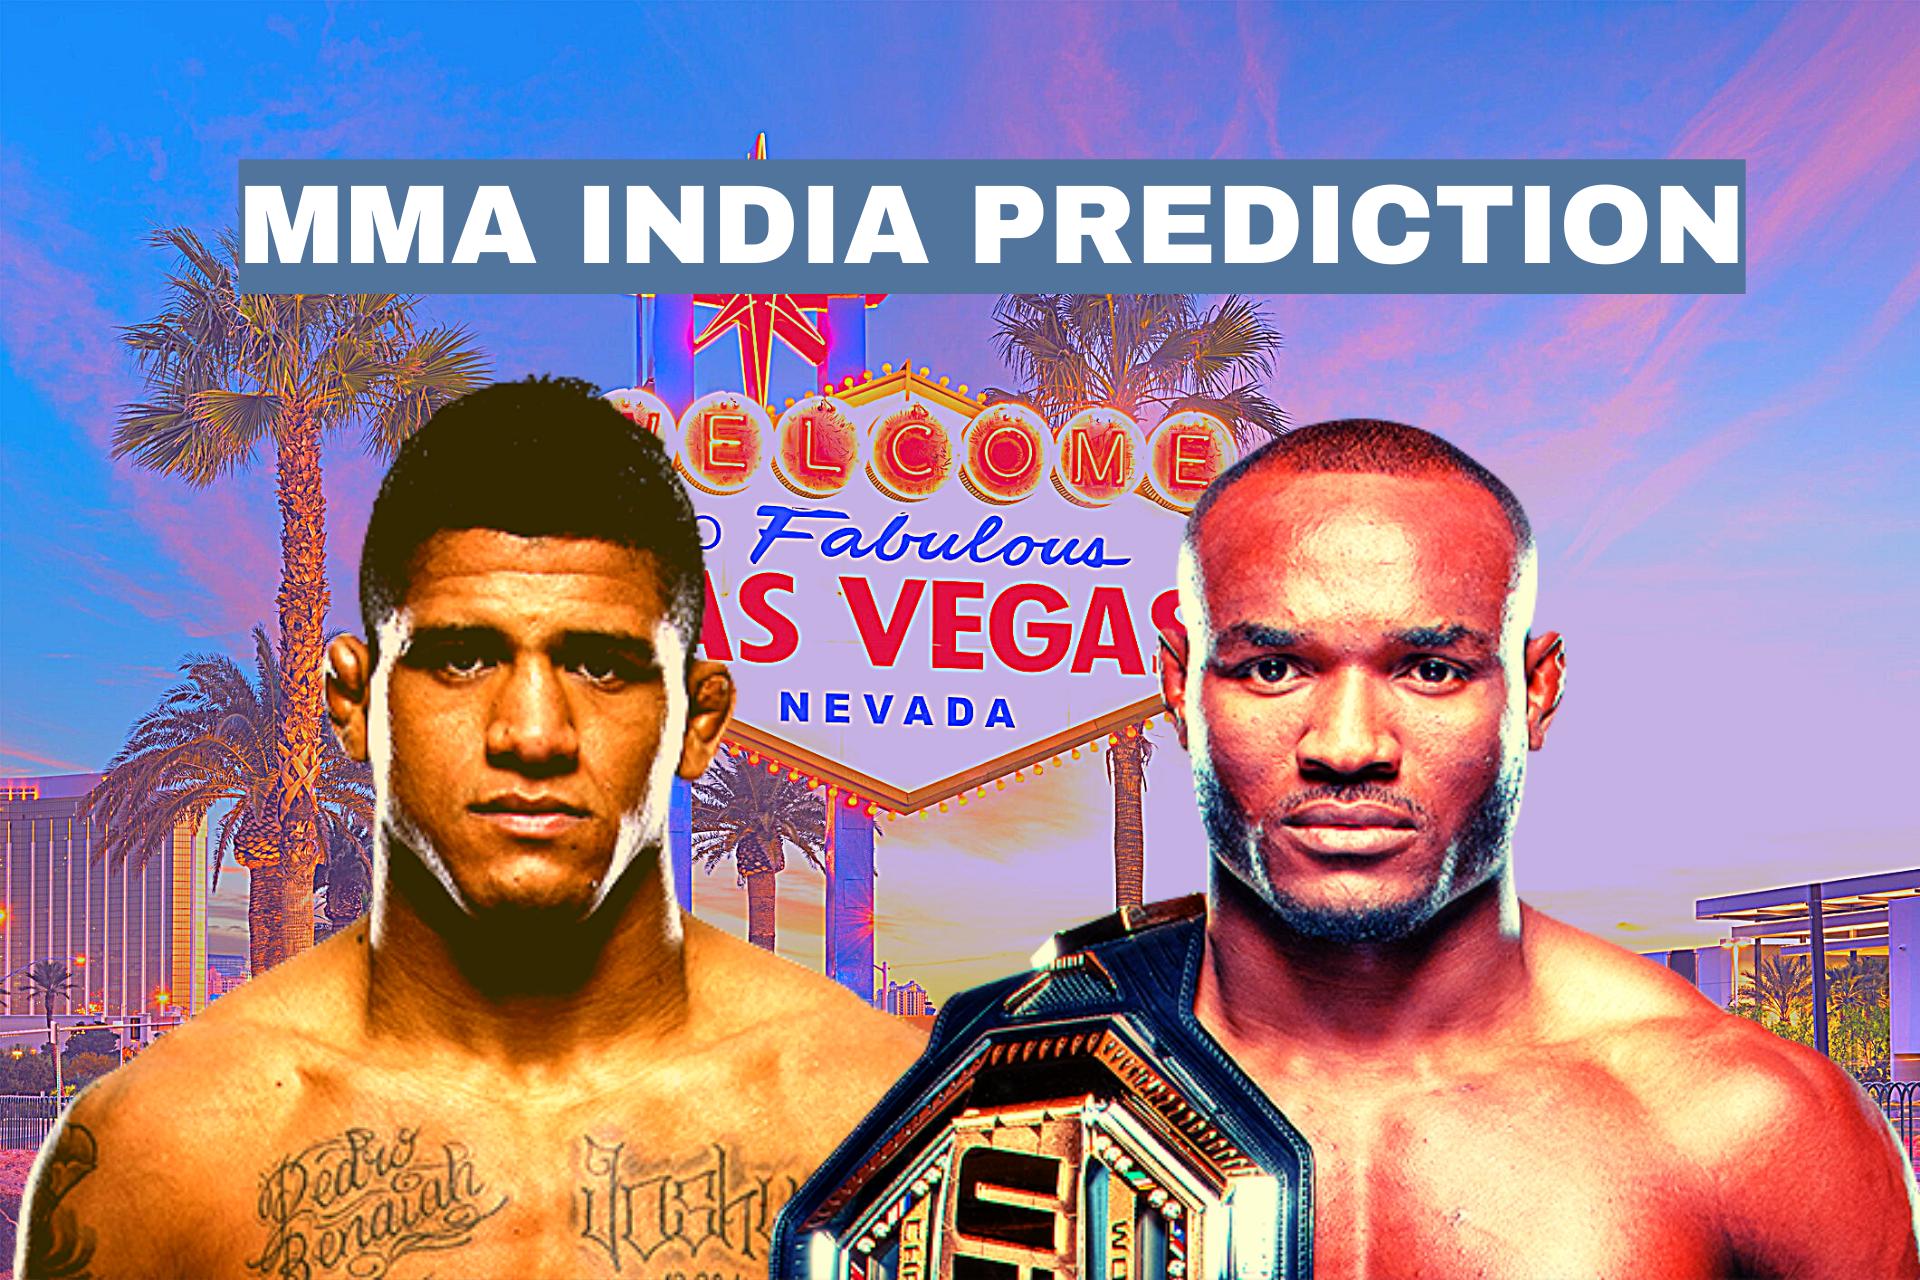 UFC 258: Usman vs Burns betting odds and prediction - Burns